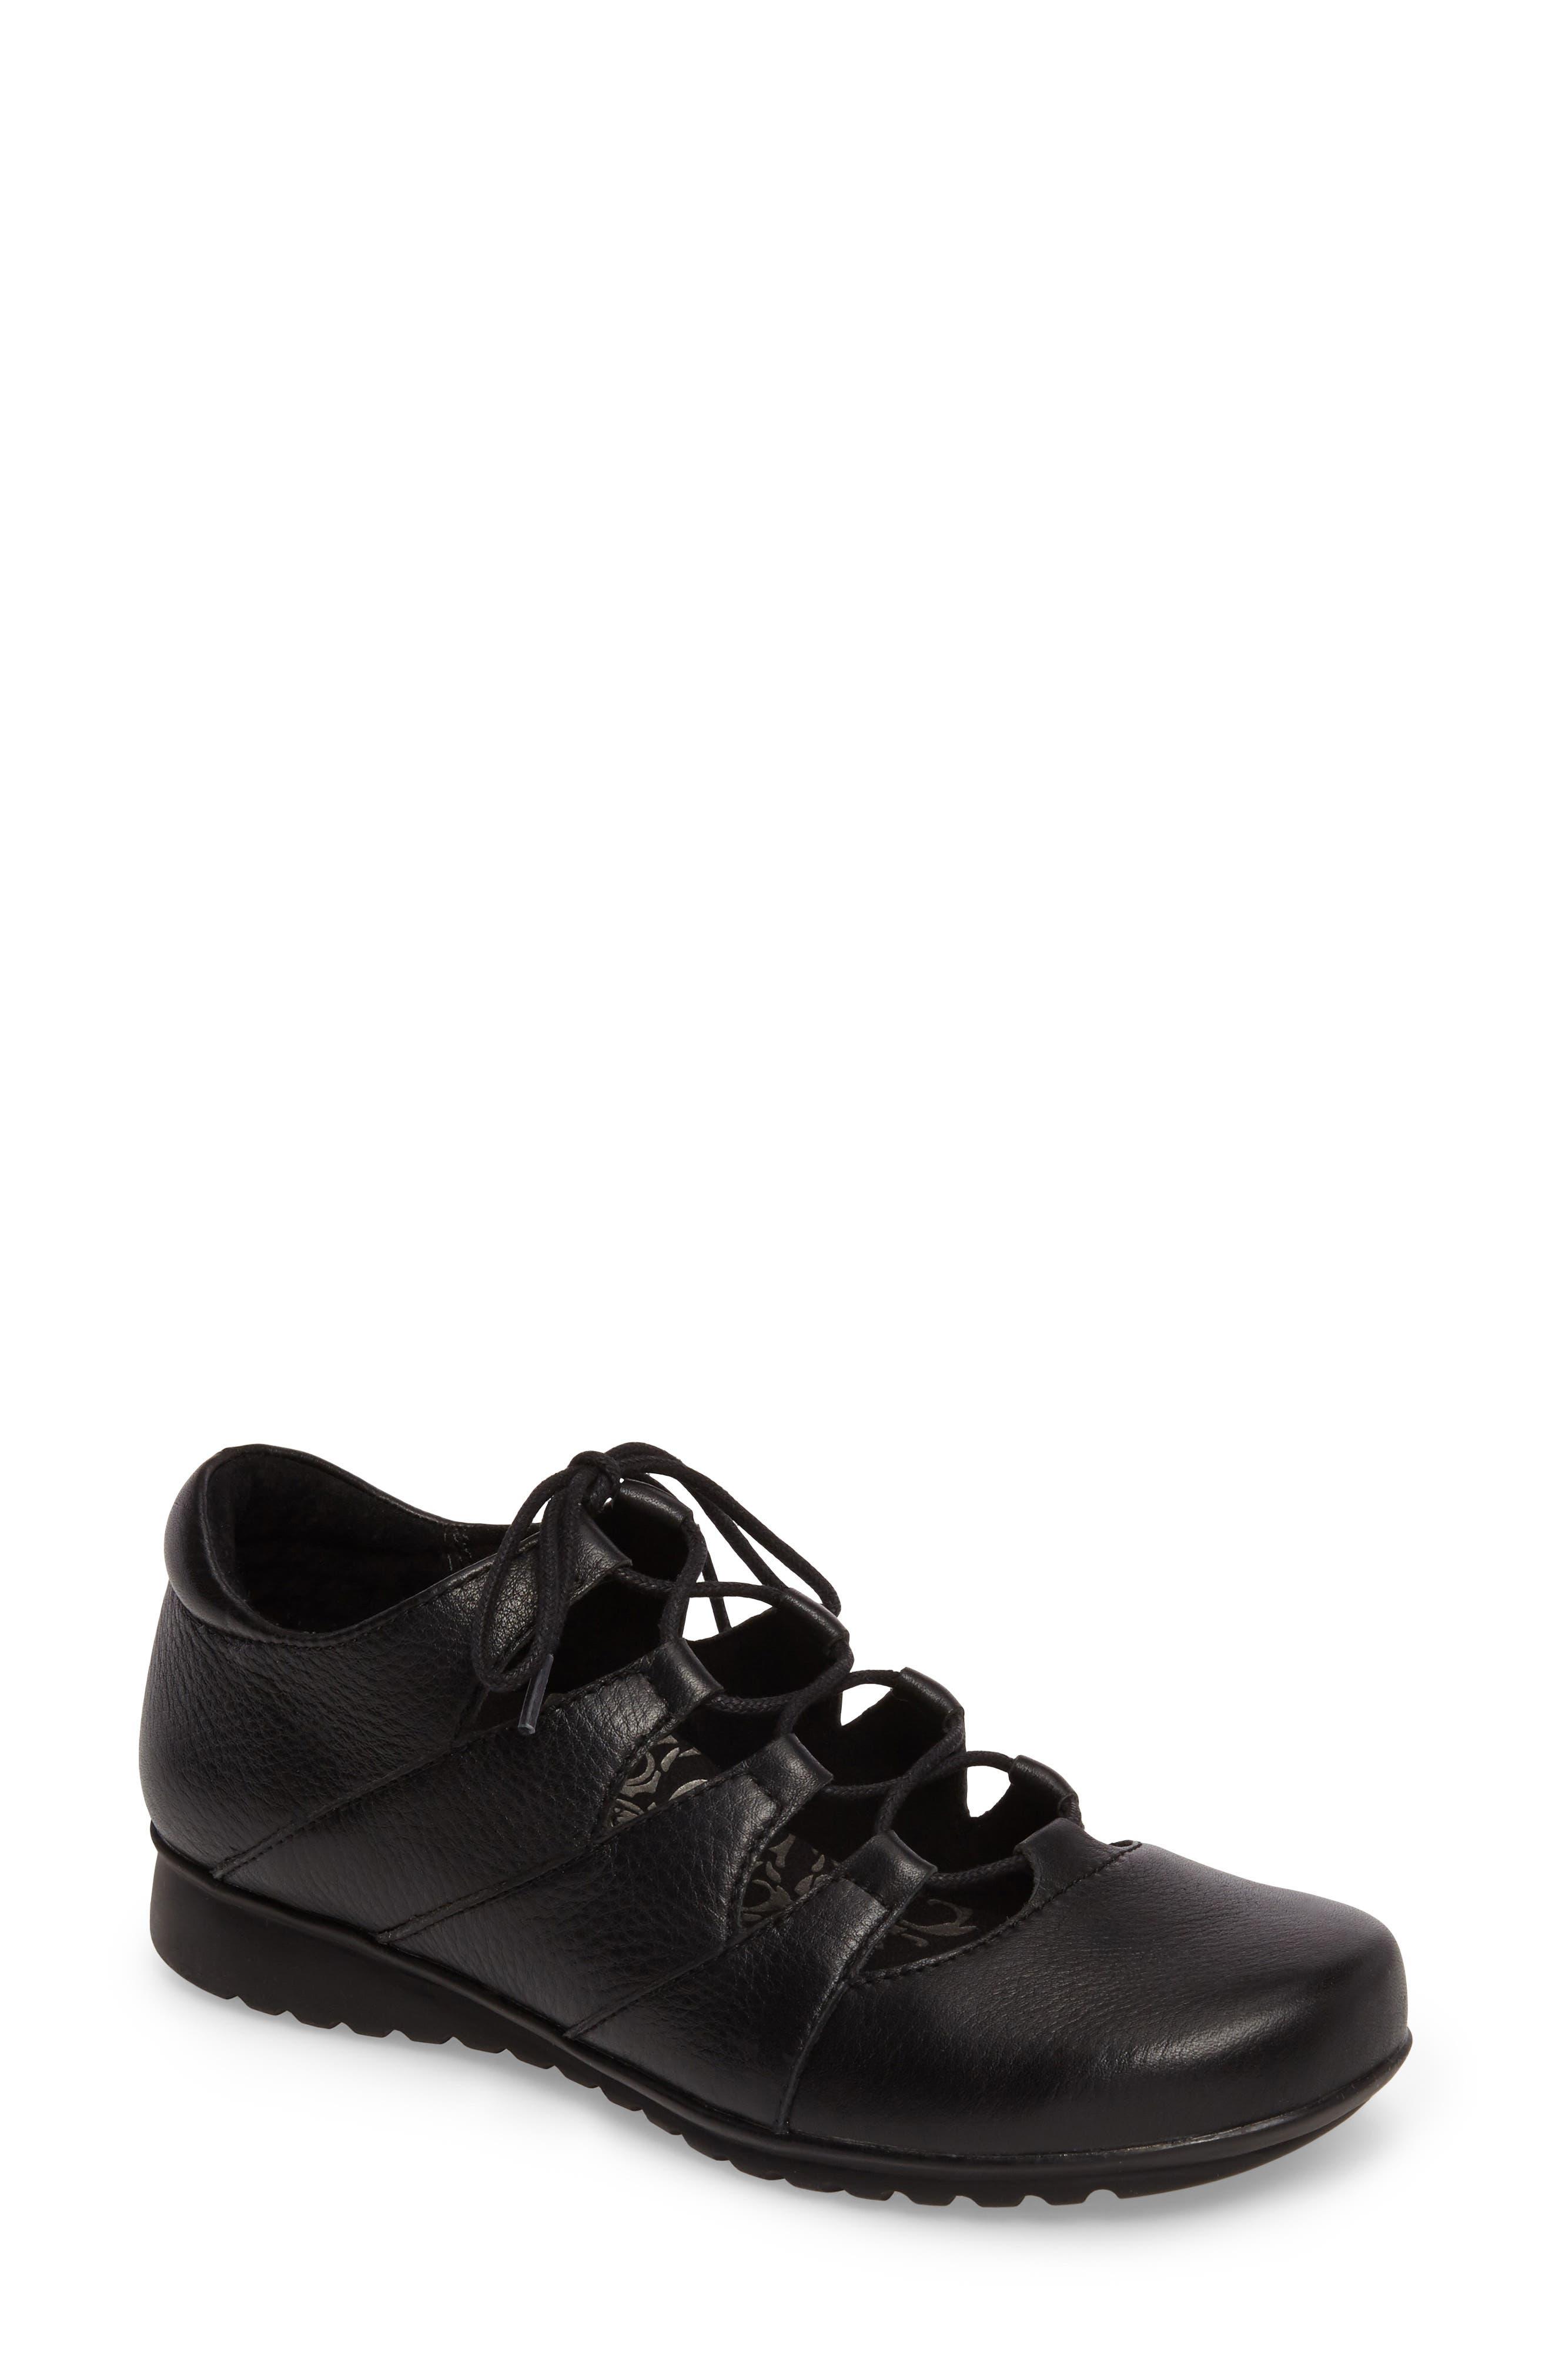 Sienna Cutout Sneaker,                         Main,                         color, BLACK LEATHER/ BLACK